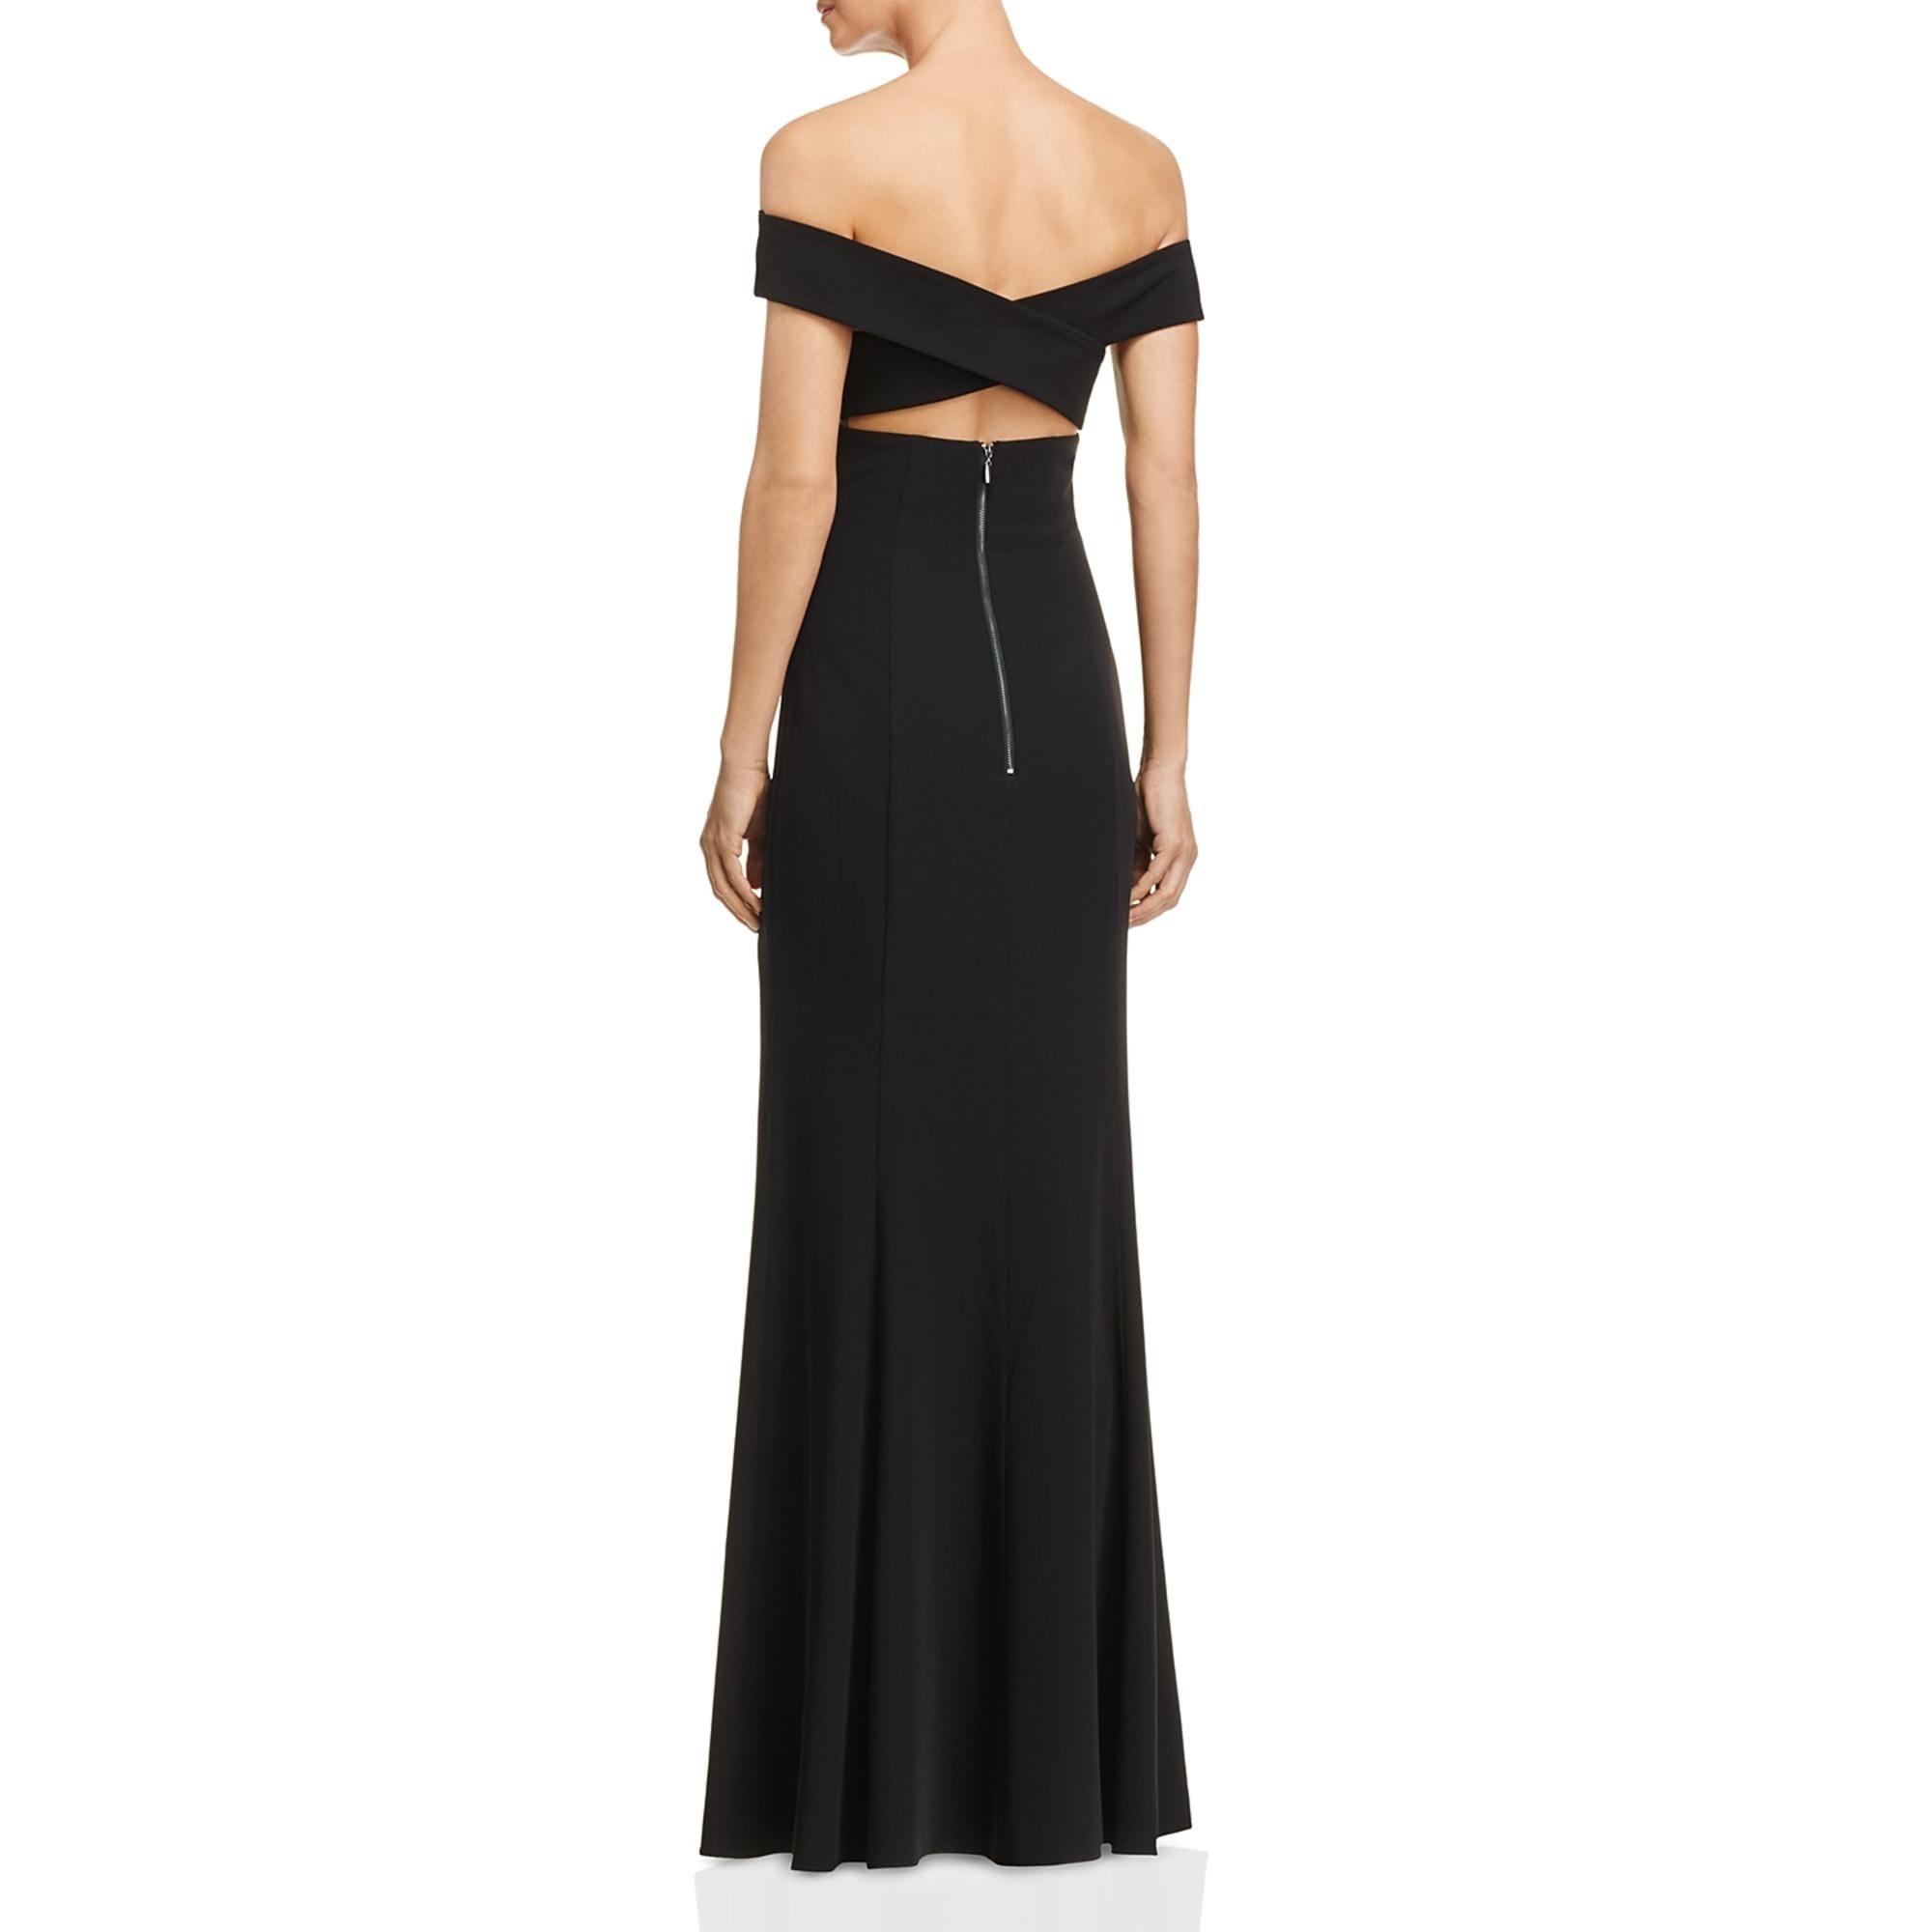 Laundry by Shelli Segal Womens Sleeveless Open Back Evening Dress